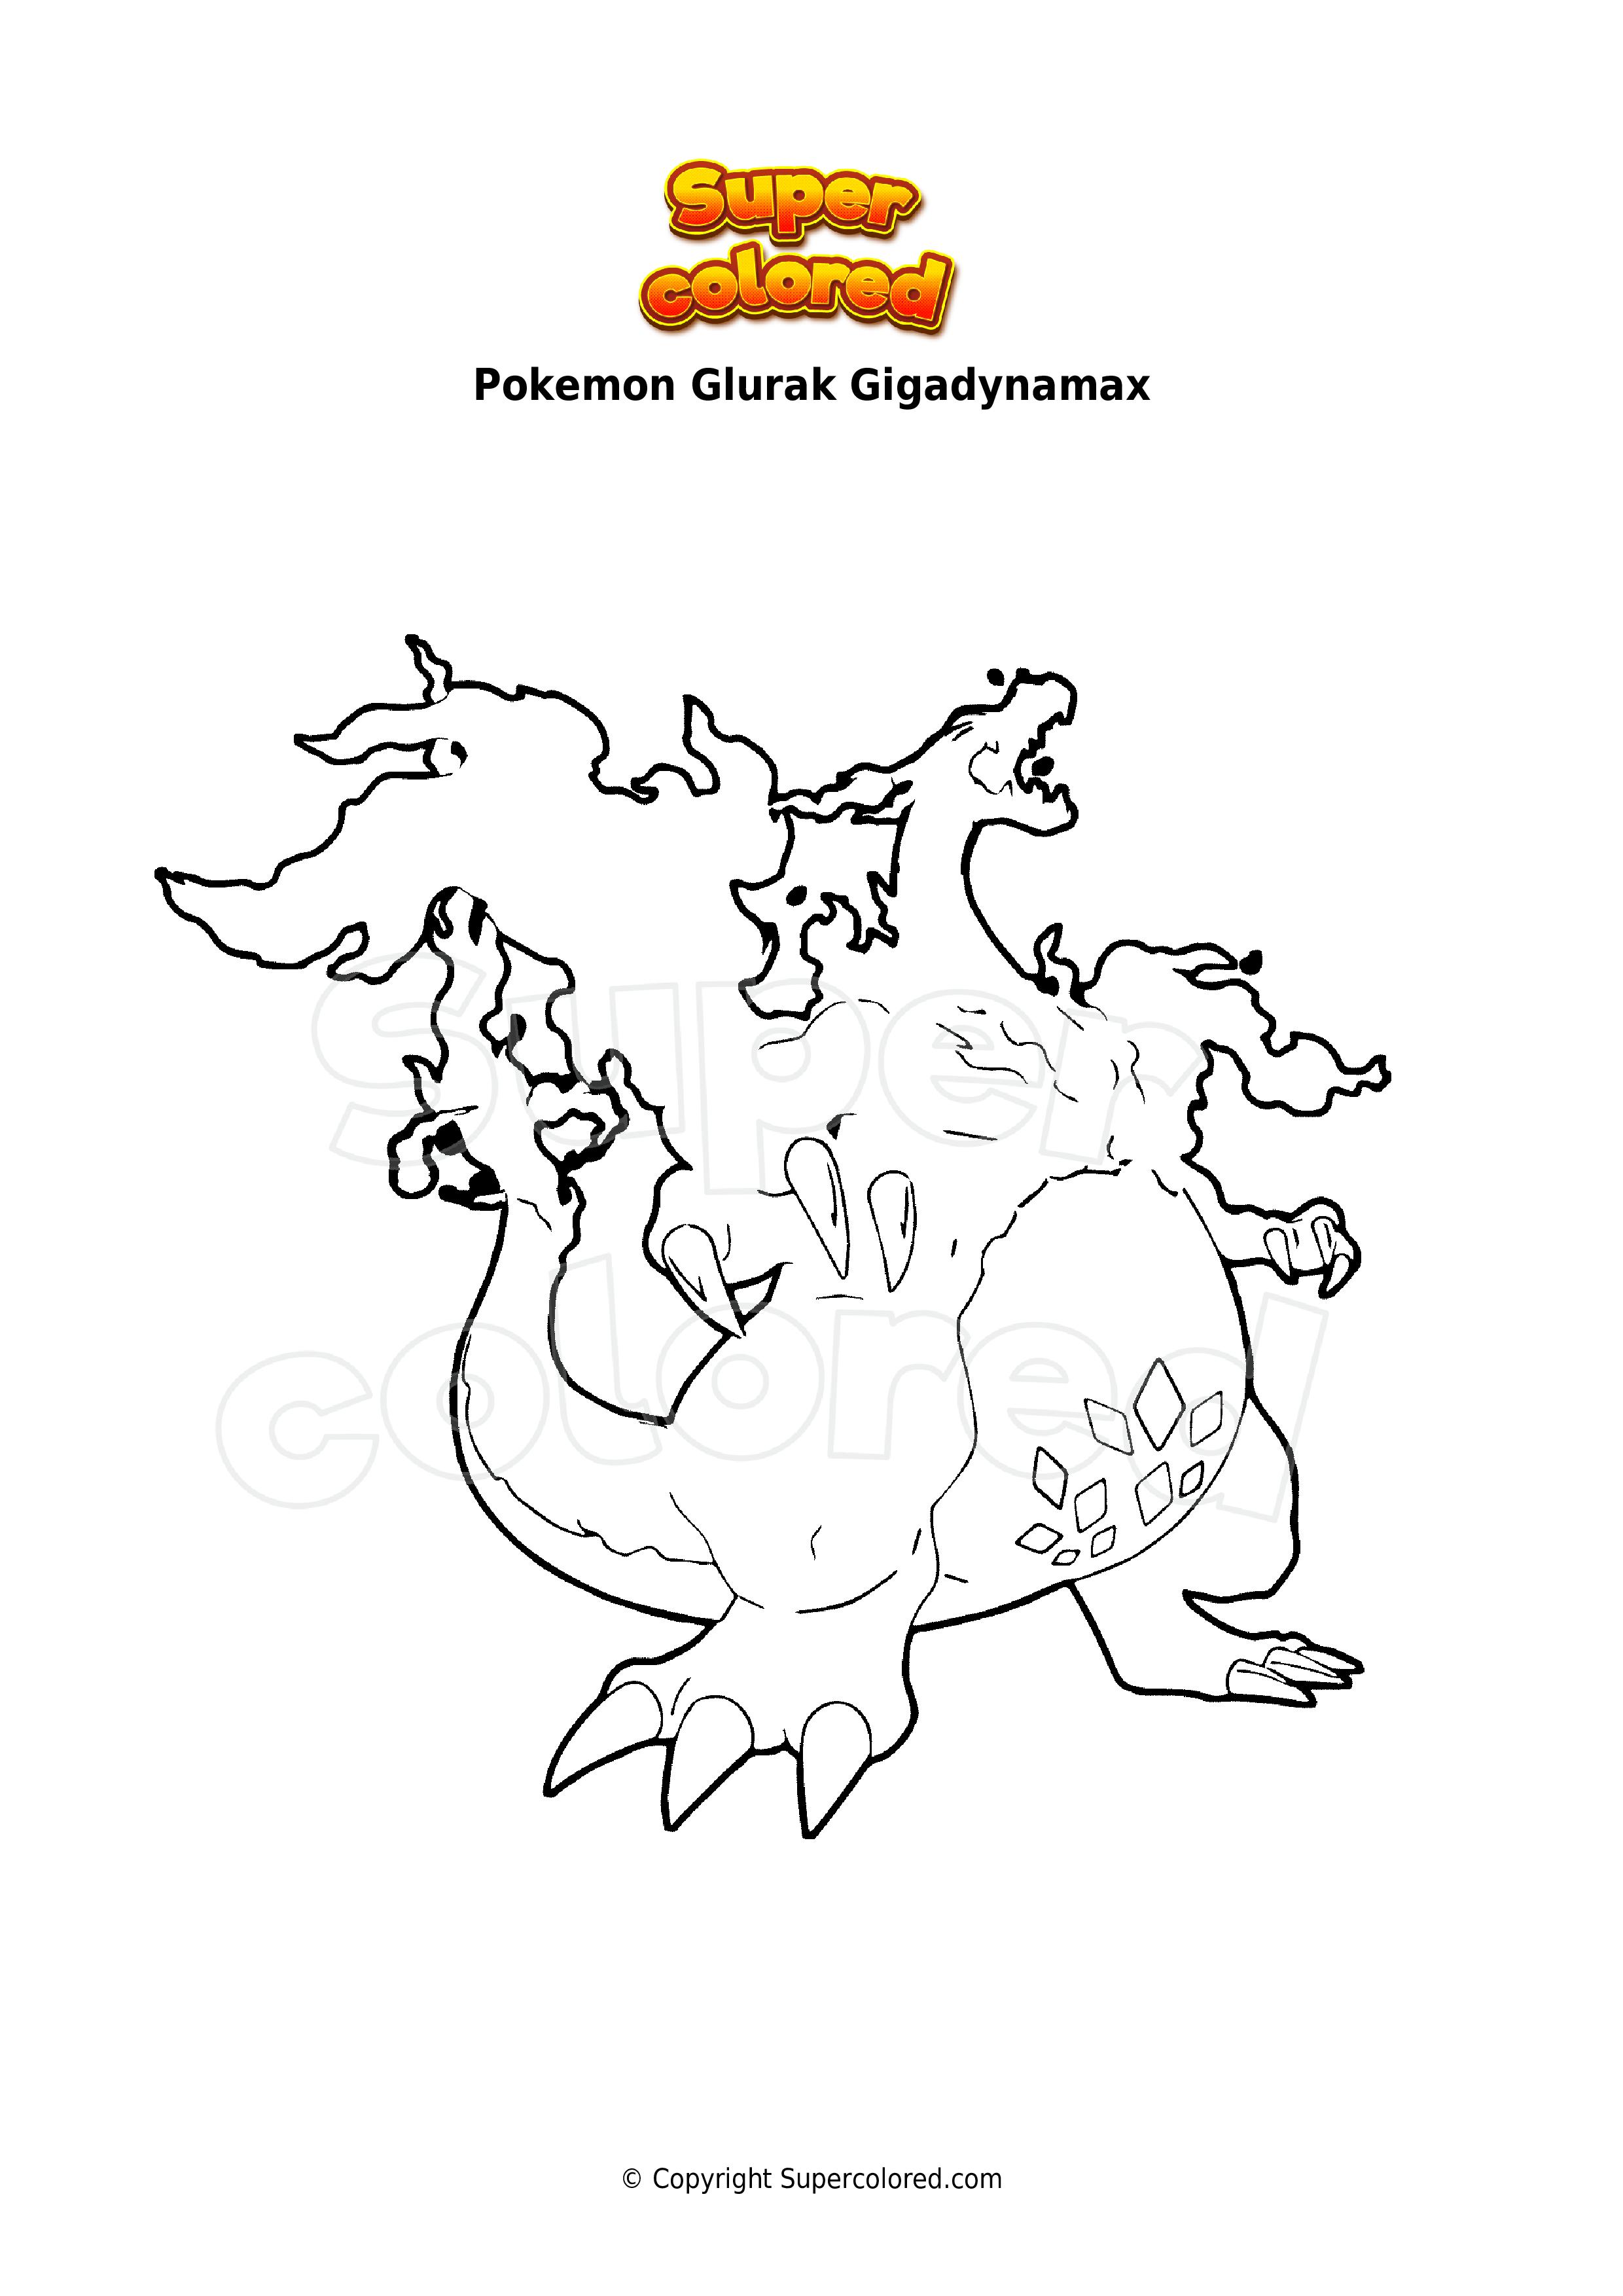 Ausmalbild Pokemon Glurak Gigadynamax - Supercolored.com